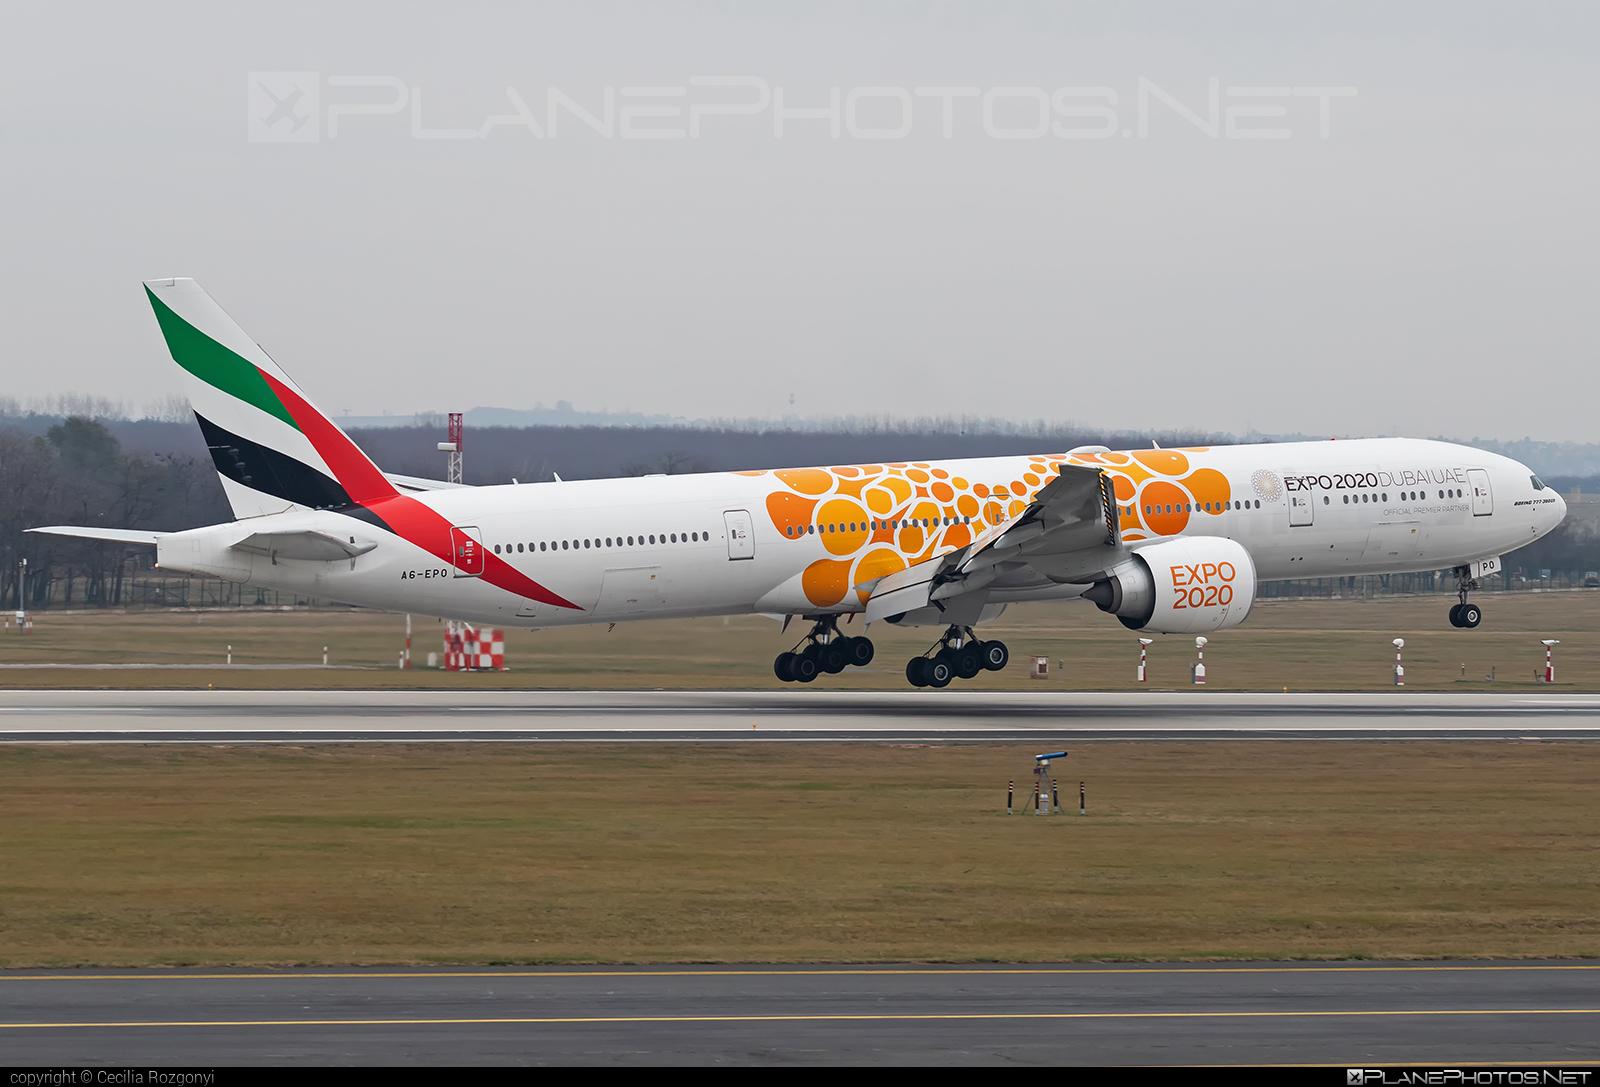 Emirates Boeing 777-300ER - A6-EPO #b777 #b777er #boeing #boeing777 #emirates #tripleseven